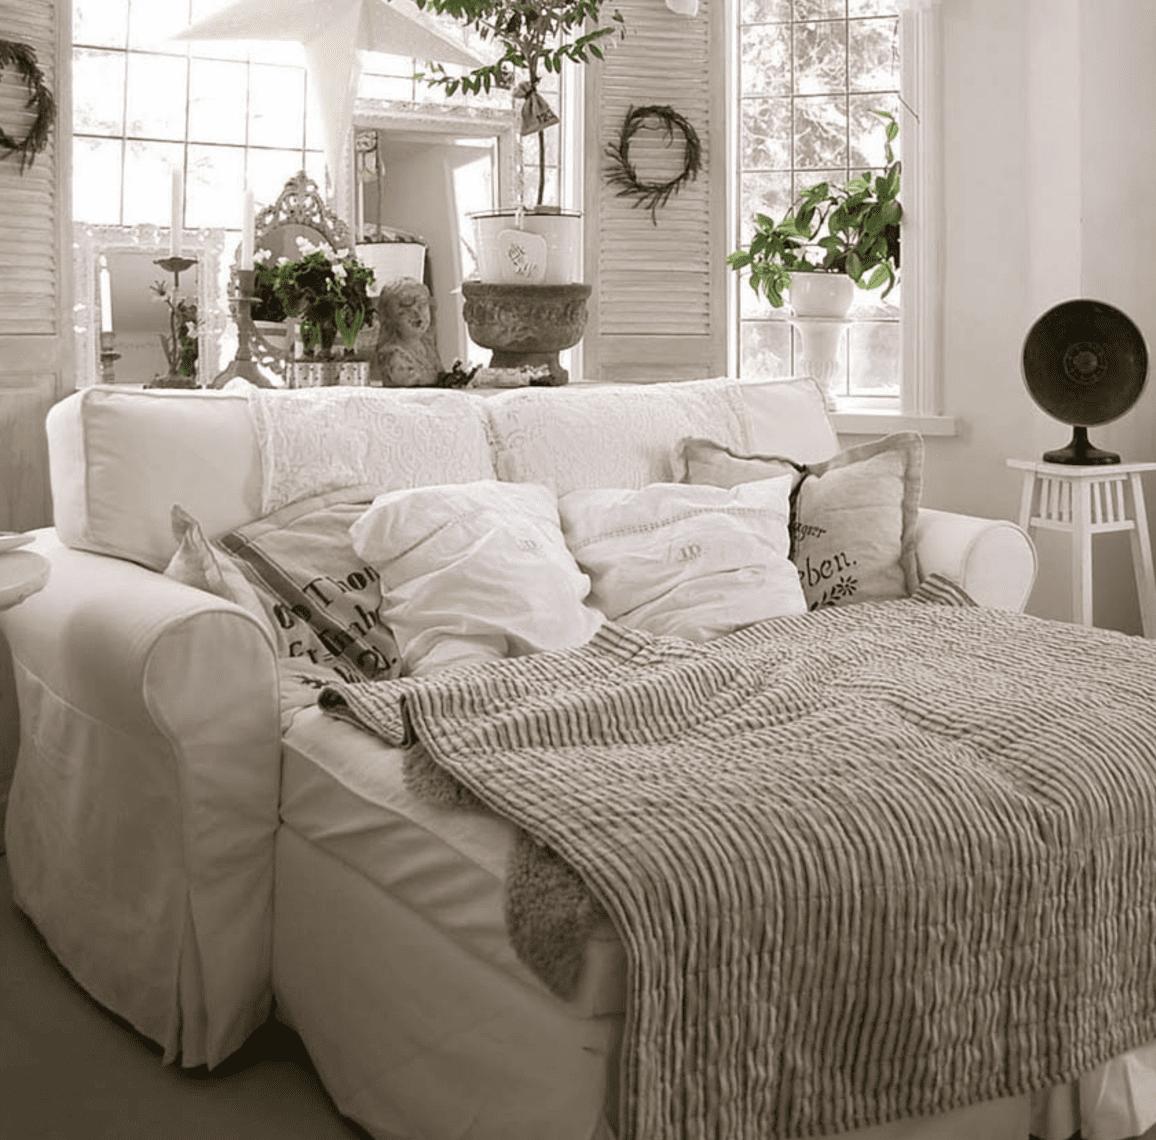 Sofá IKEA Ektorp con funda de Comfort Works